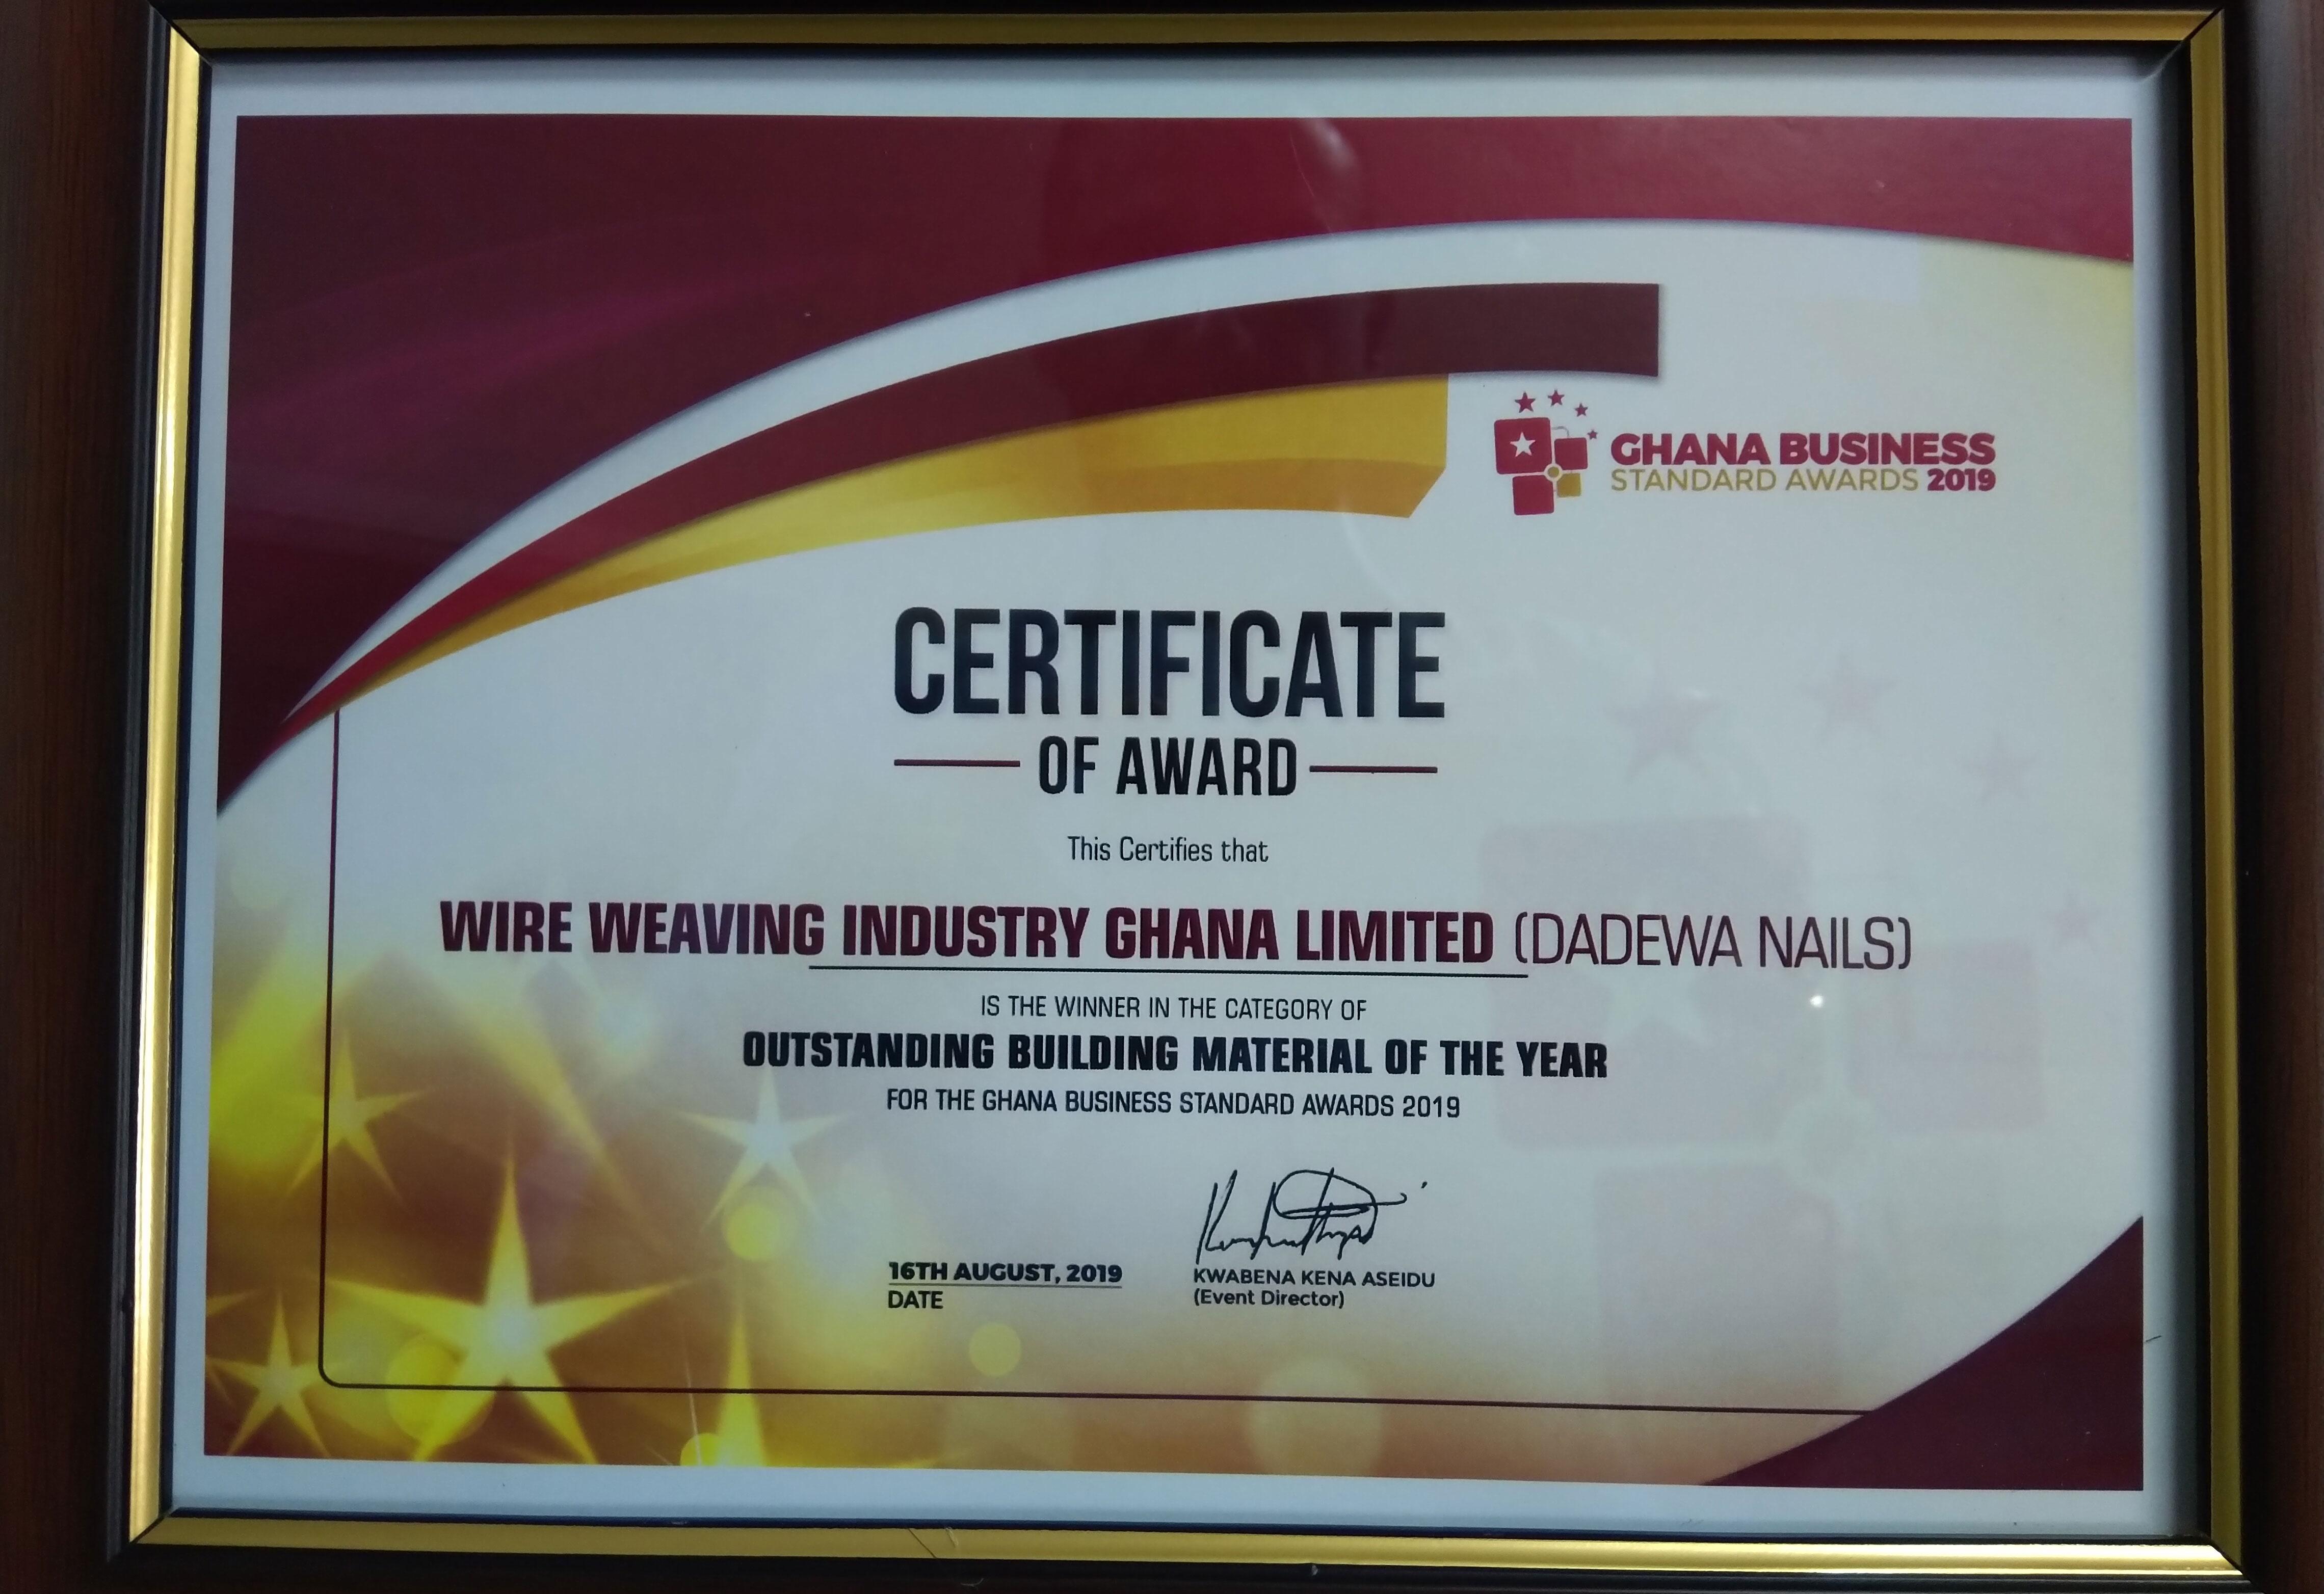 Ghana Business Standard Awards